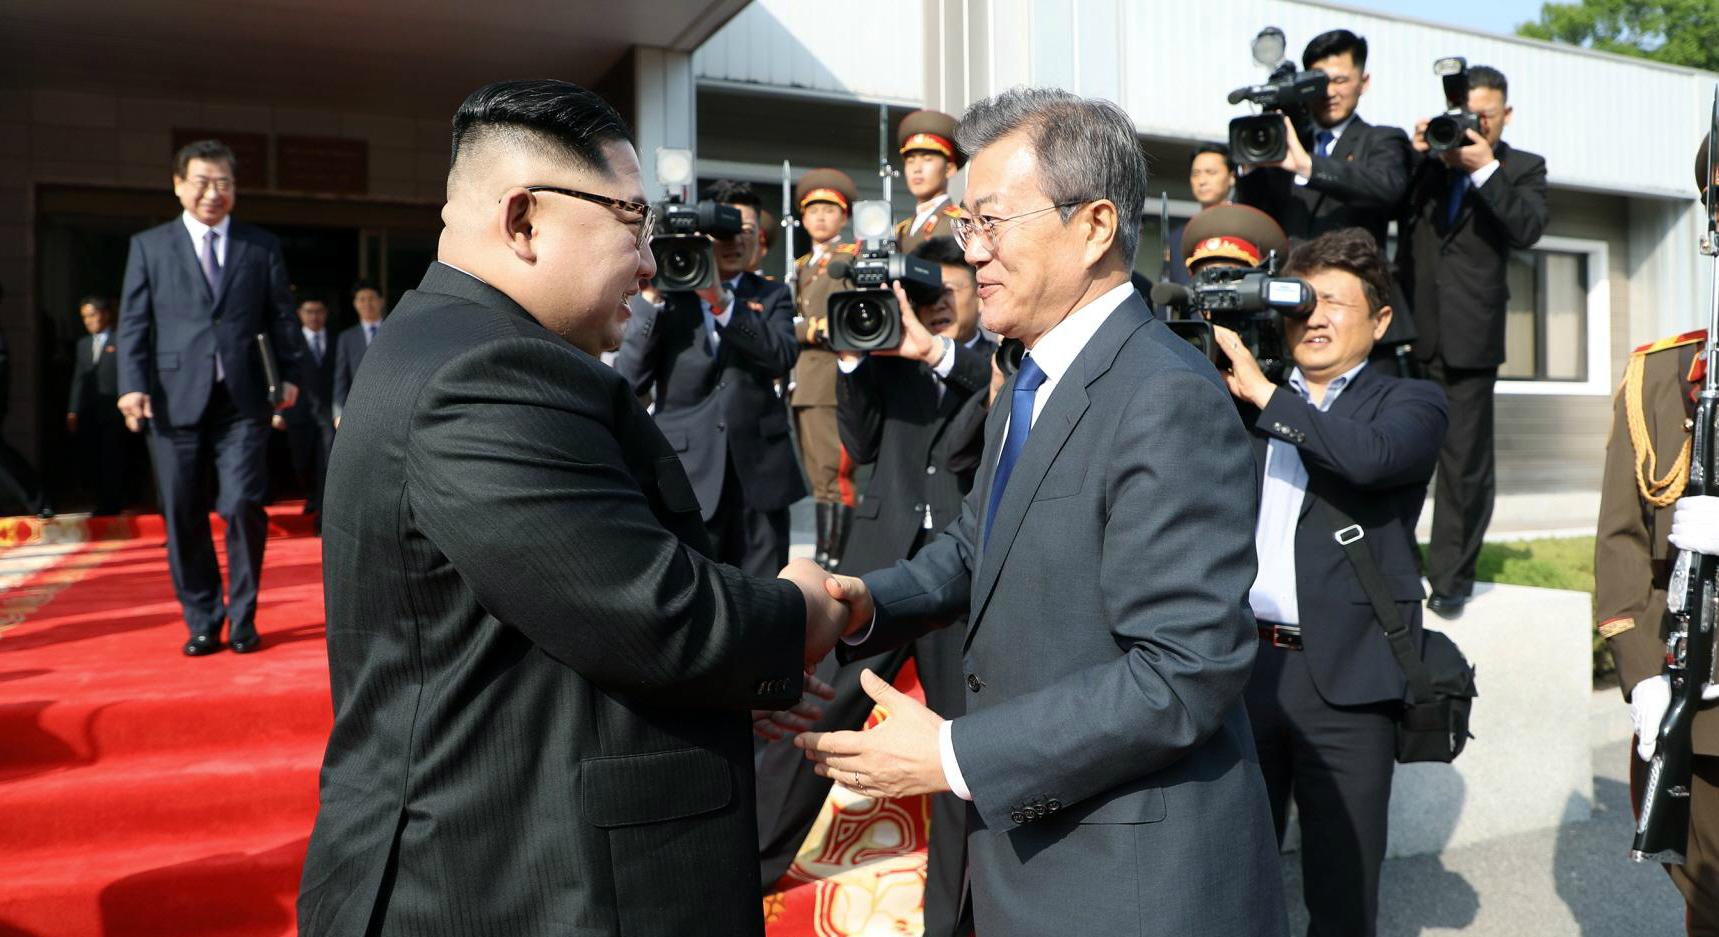 South Korean President says he's ready to meet Kim Jong Un 'regardless of venue'